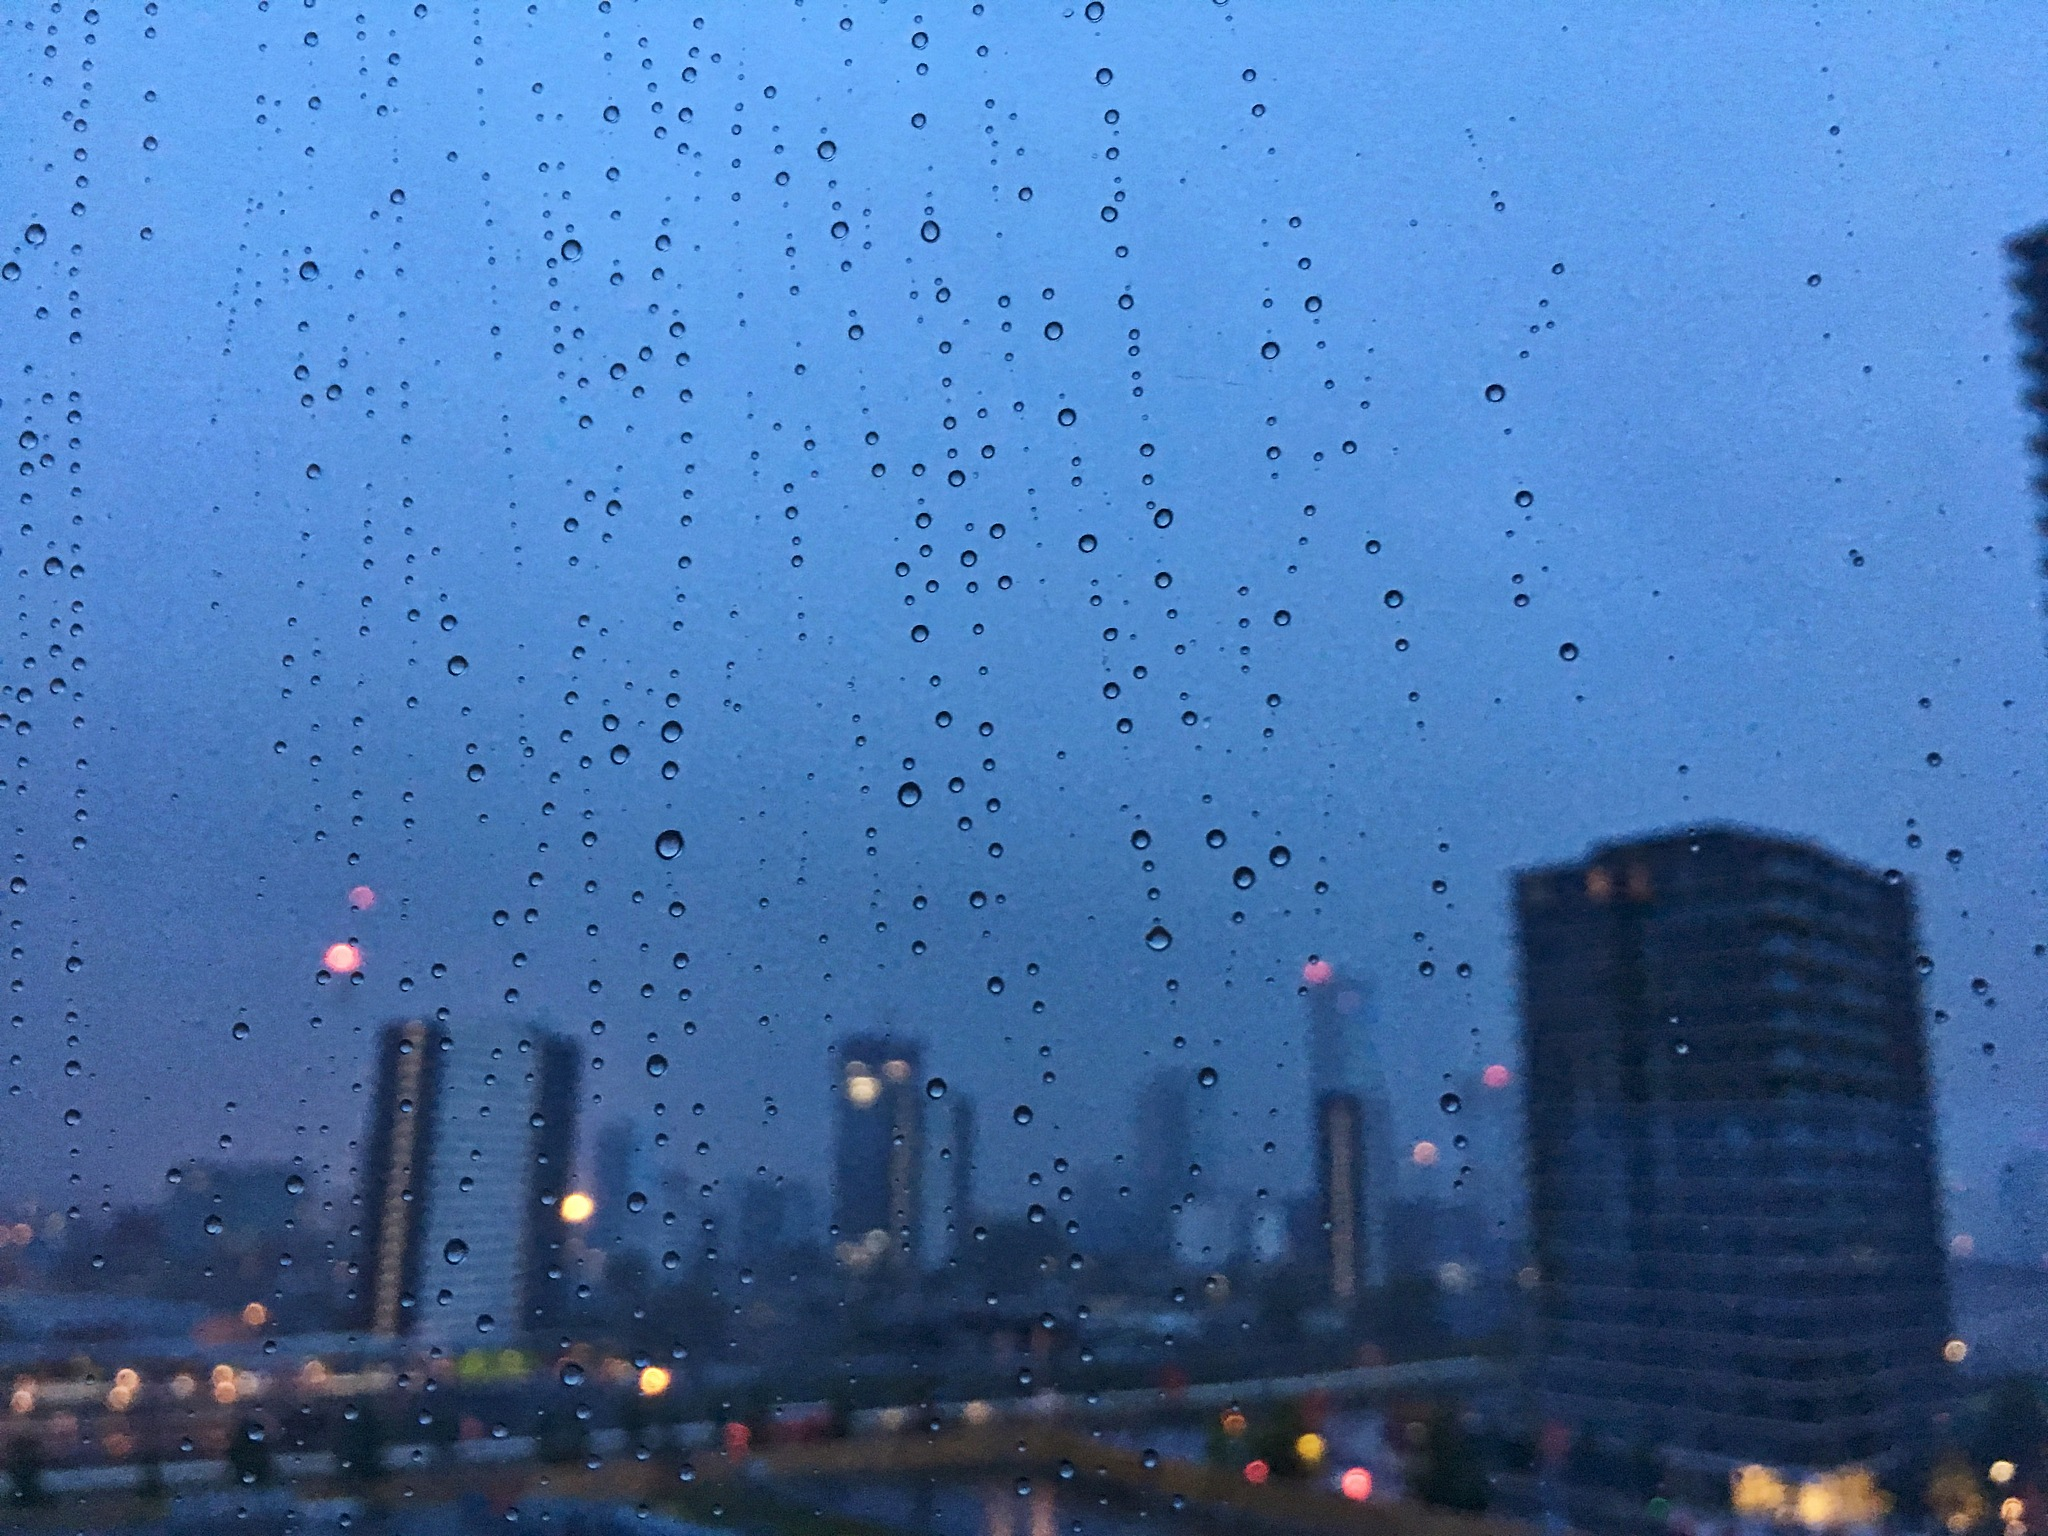 Soggy City by DJW